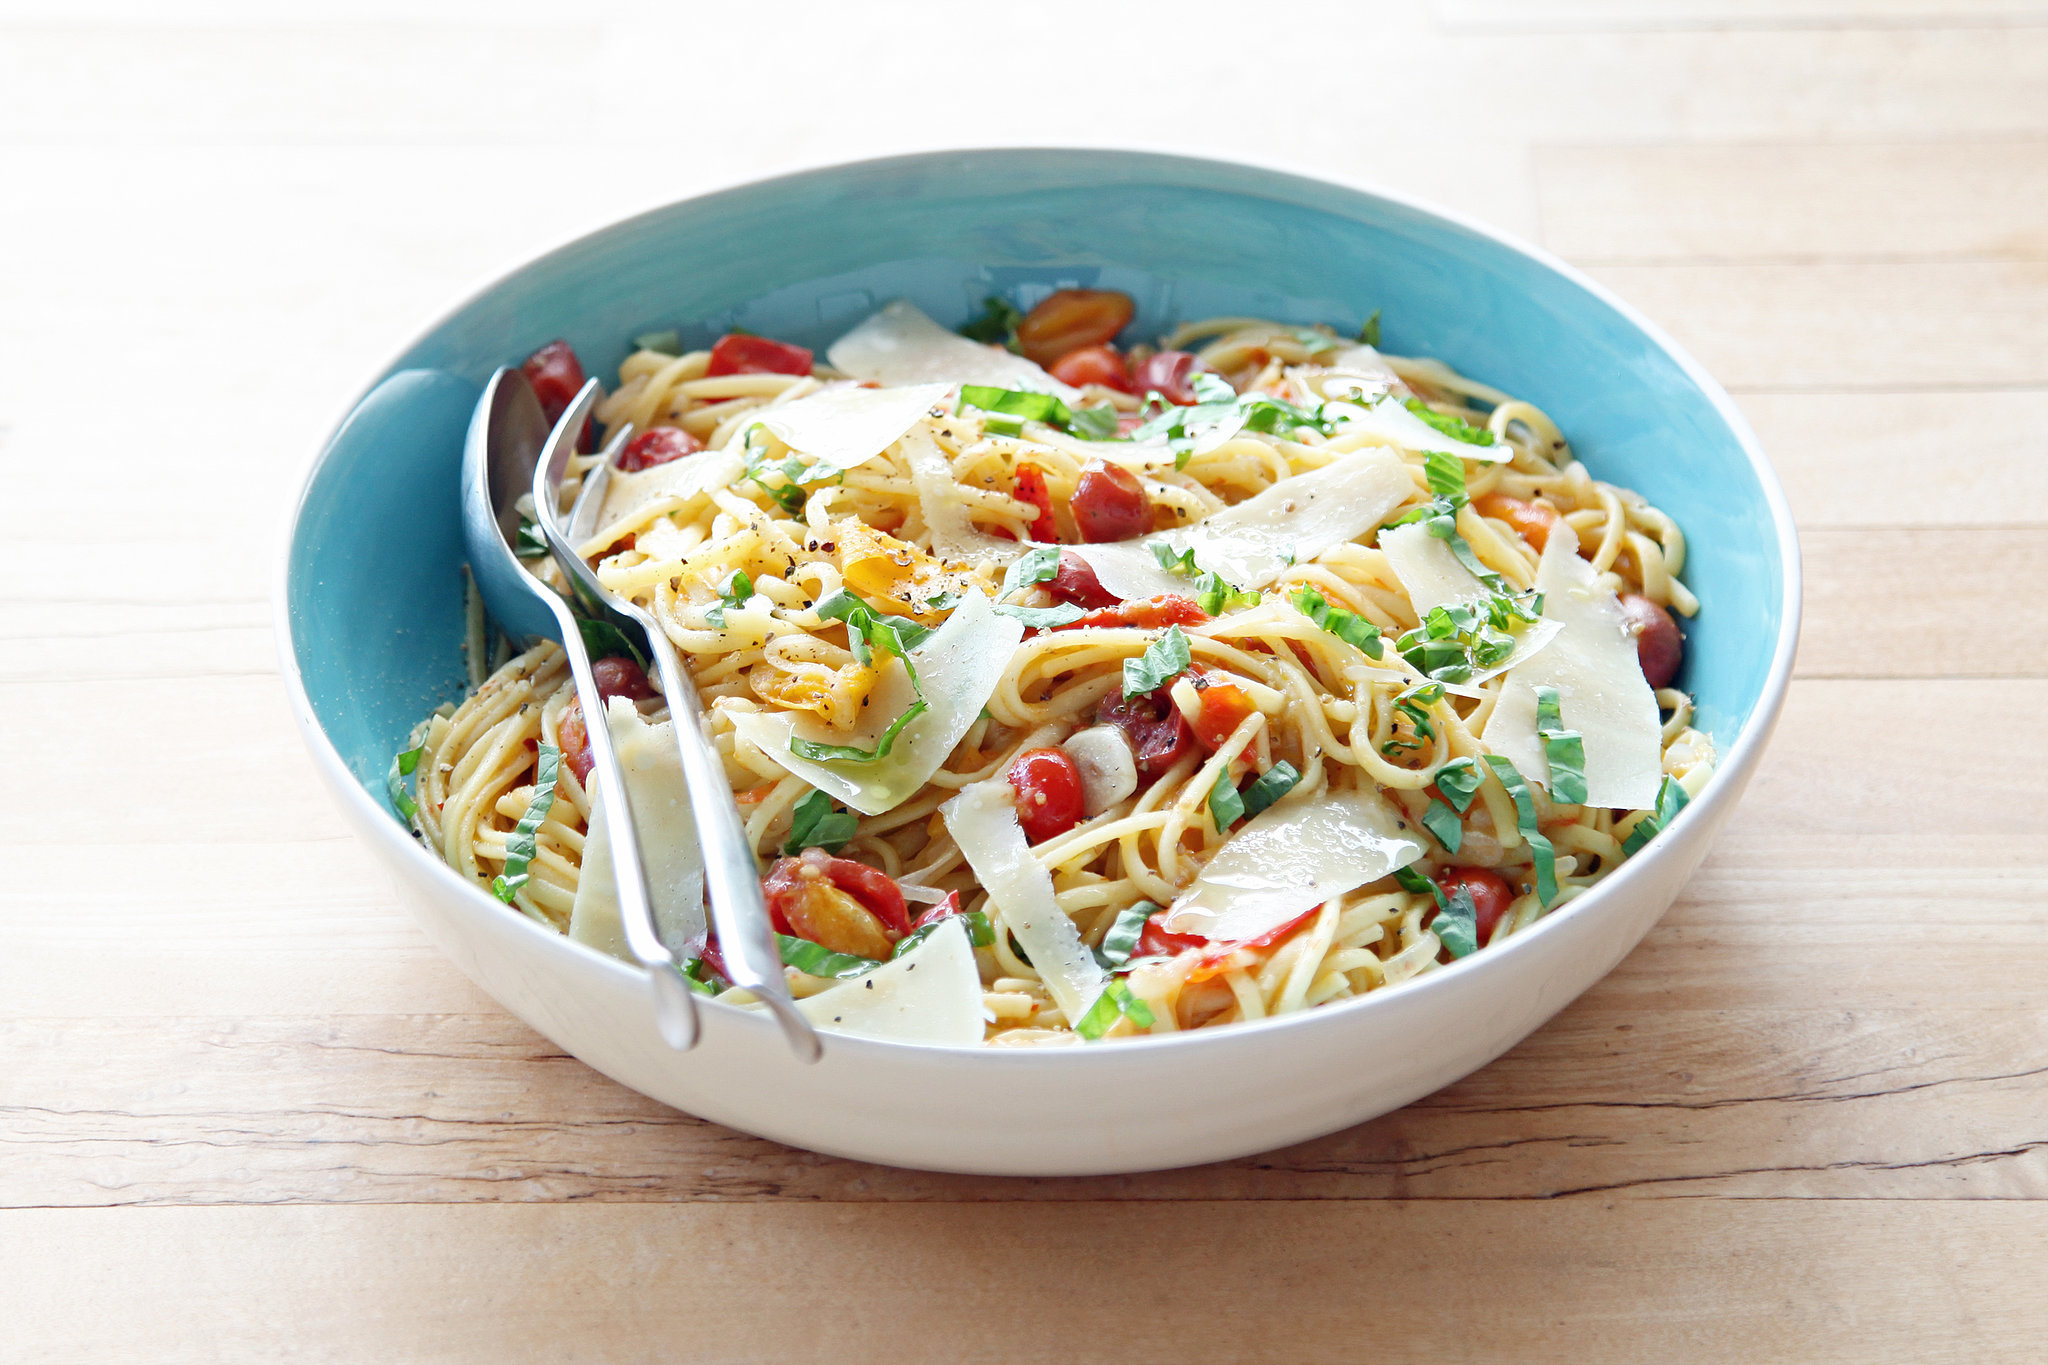 5c0a926a_Martha-Stewart_s-Tomato-One-Pot-Pasta.xxxlarge_2x (1)